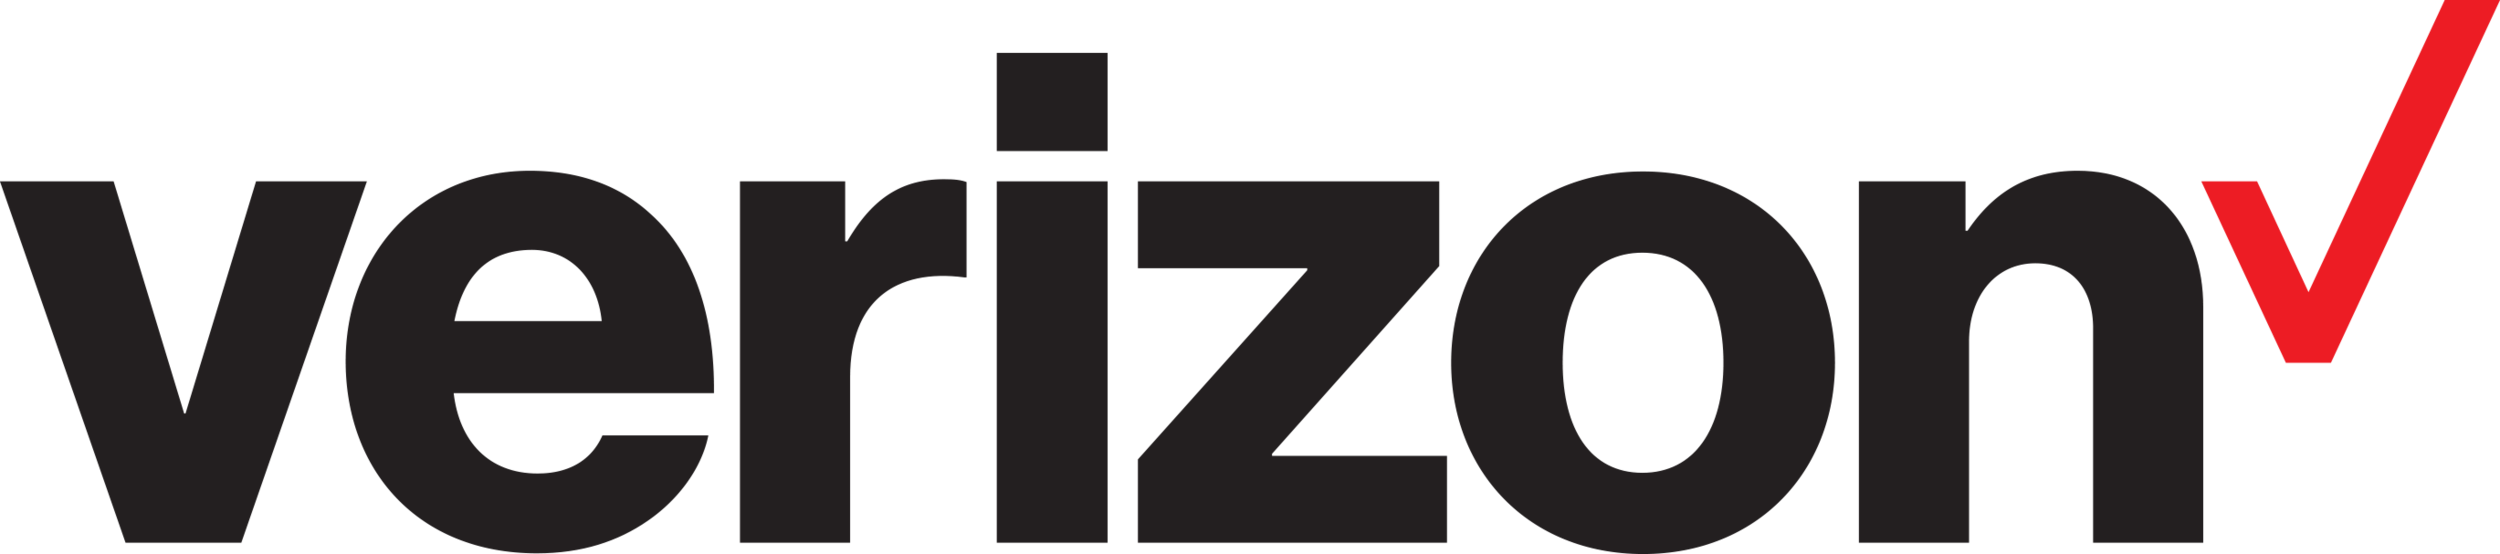 Verizon Color Logo_New Brand_vz_cmyk_p.png